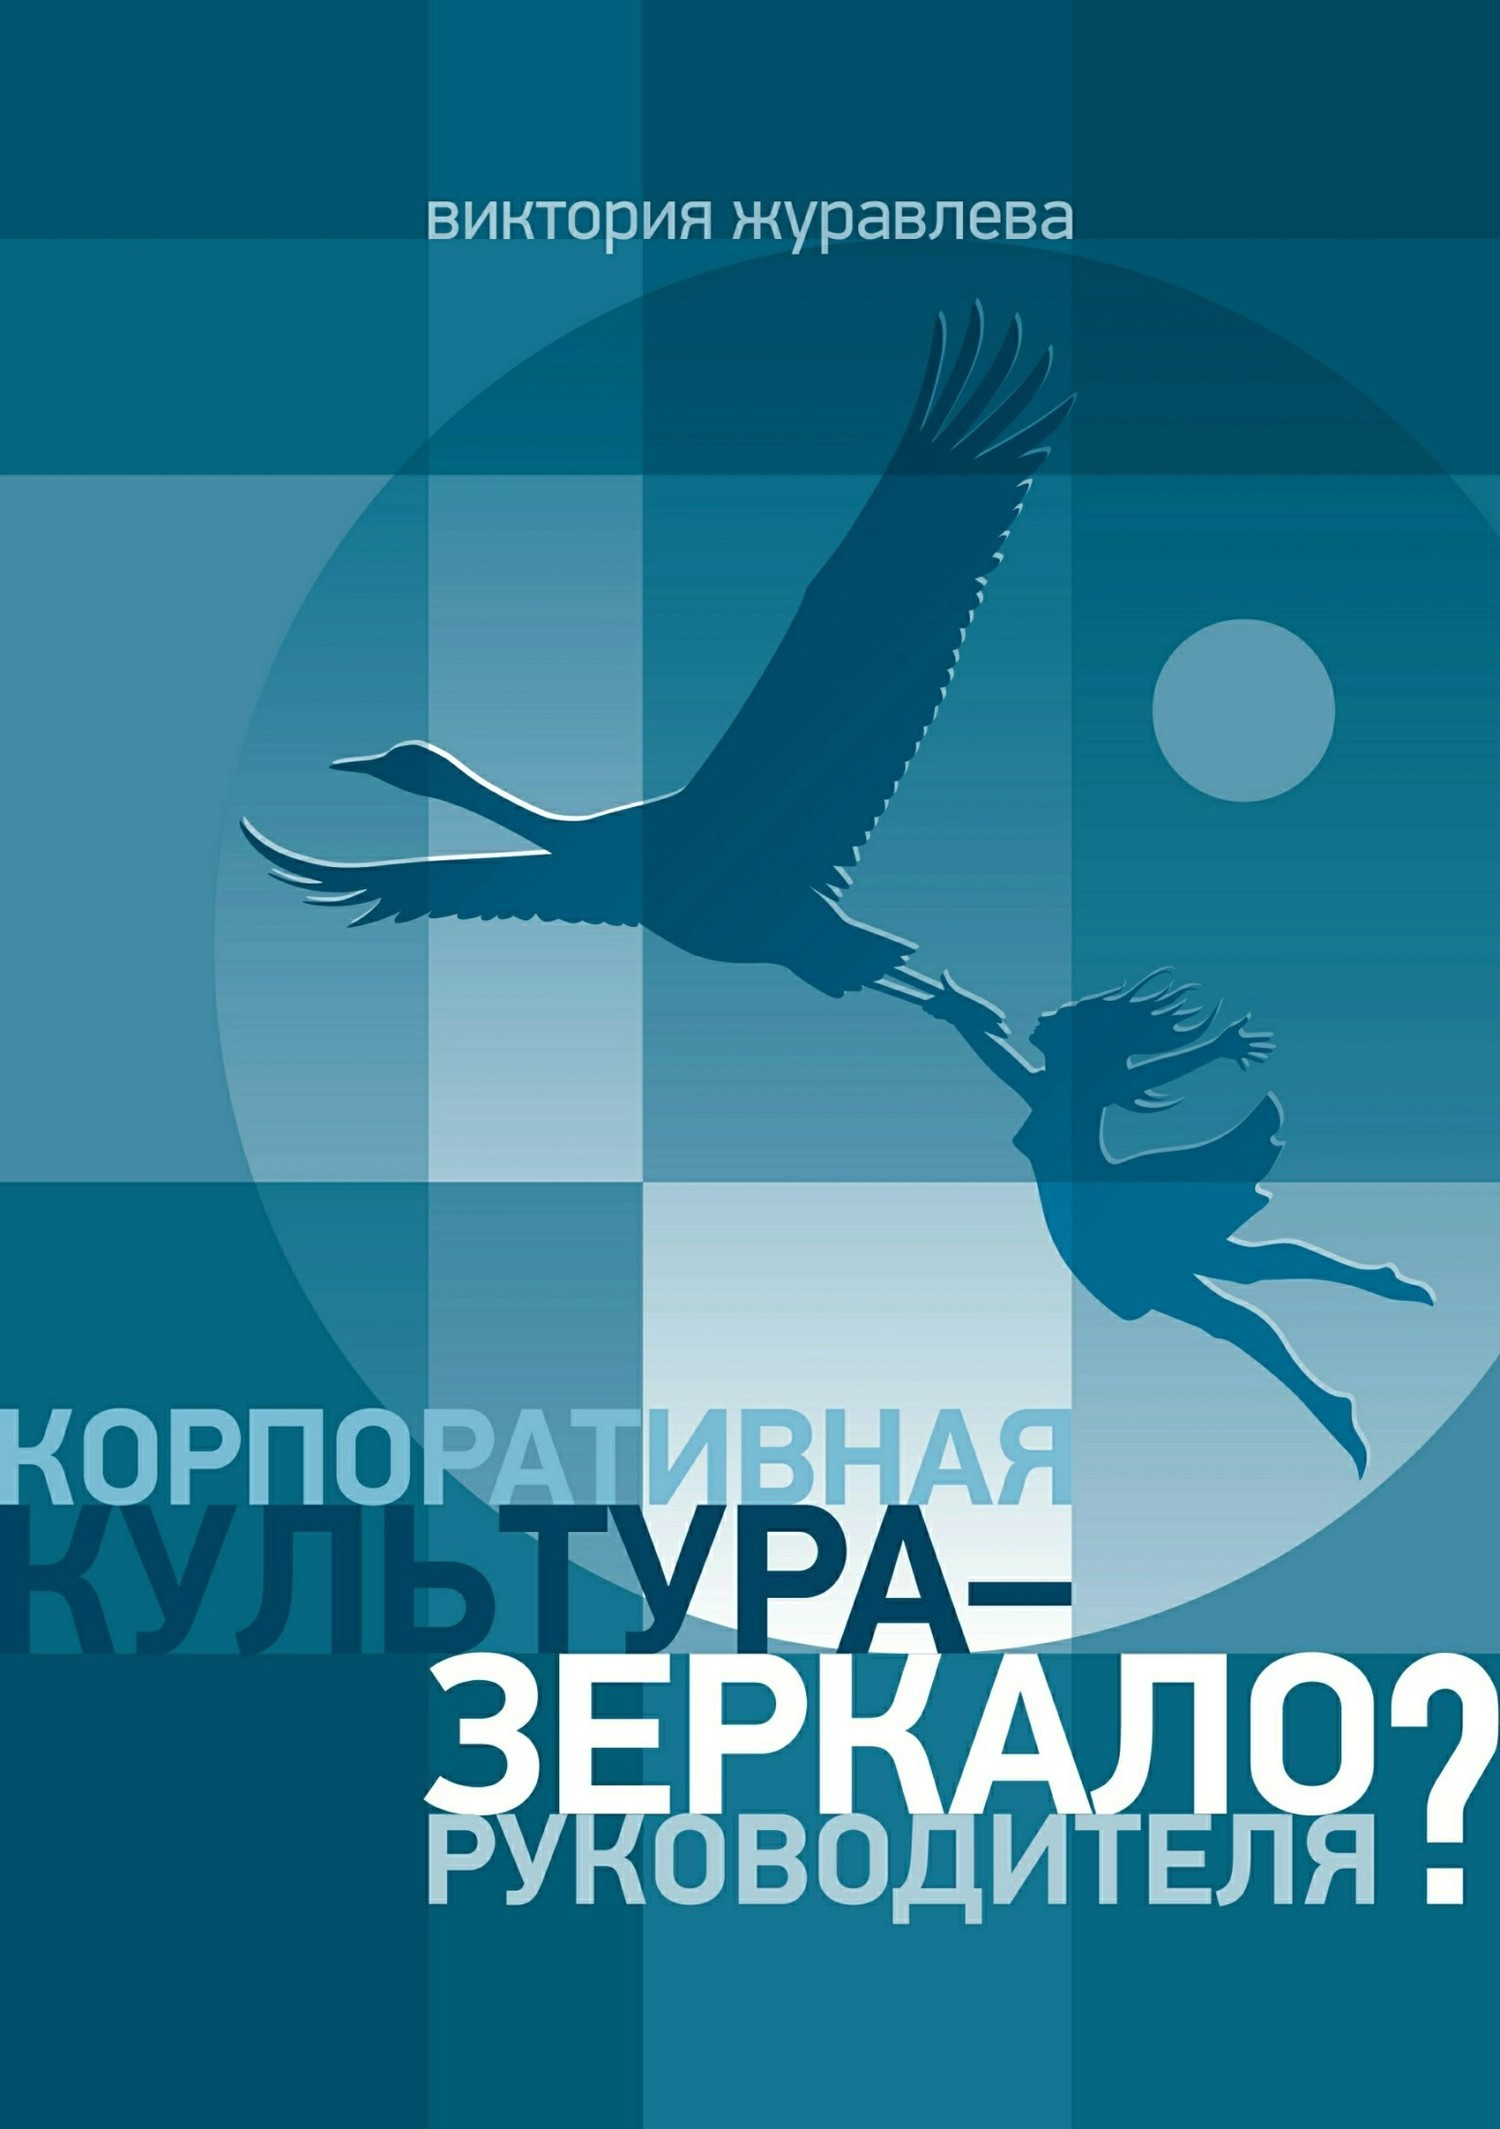 Обложка книги. Автор - Виктория Журавлева